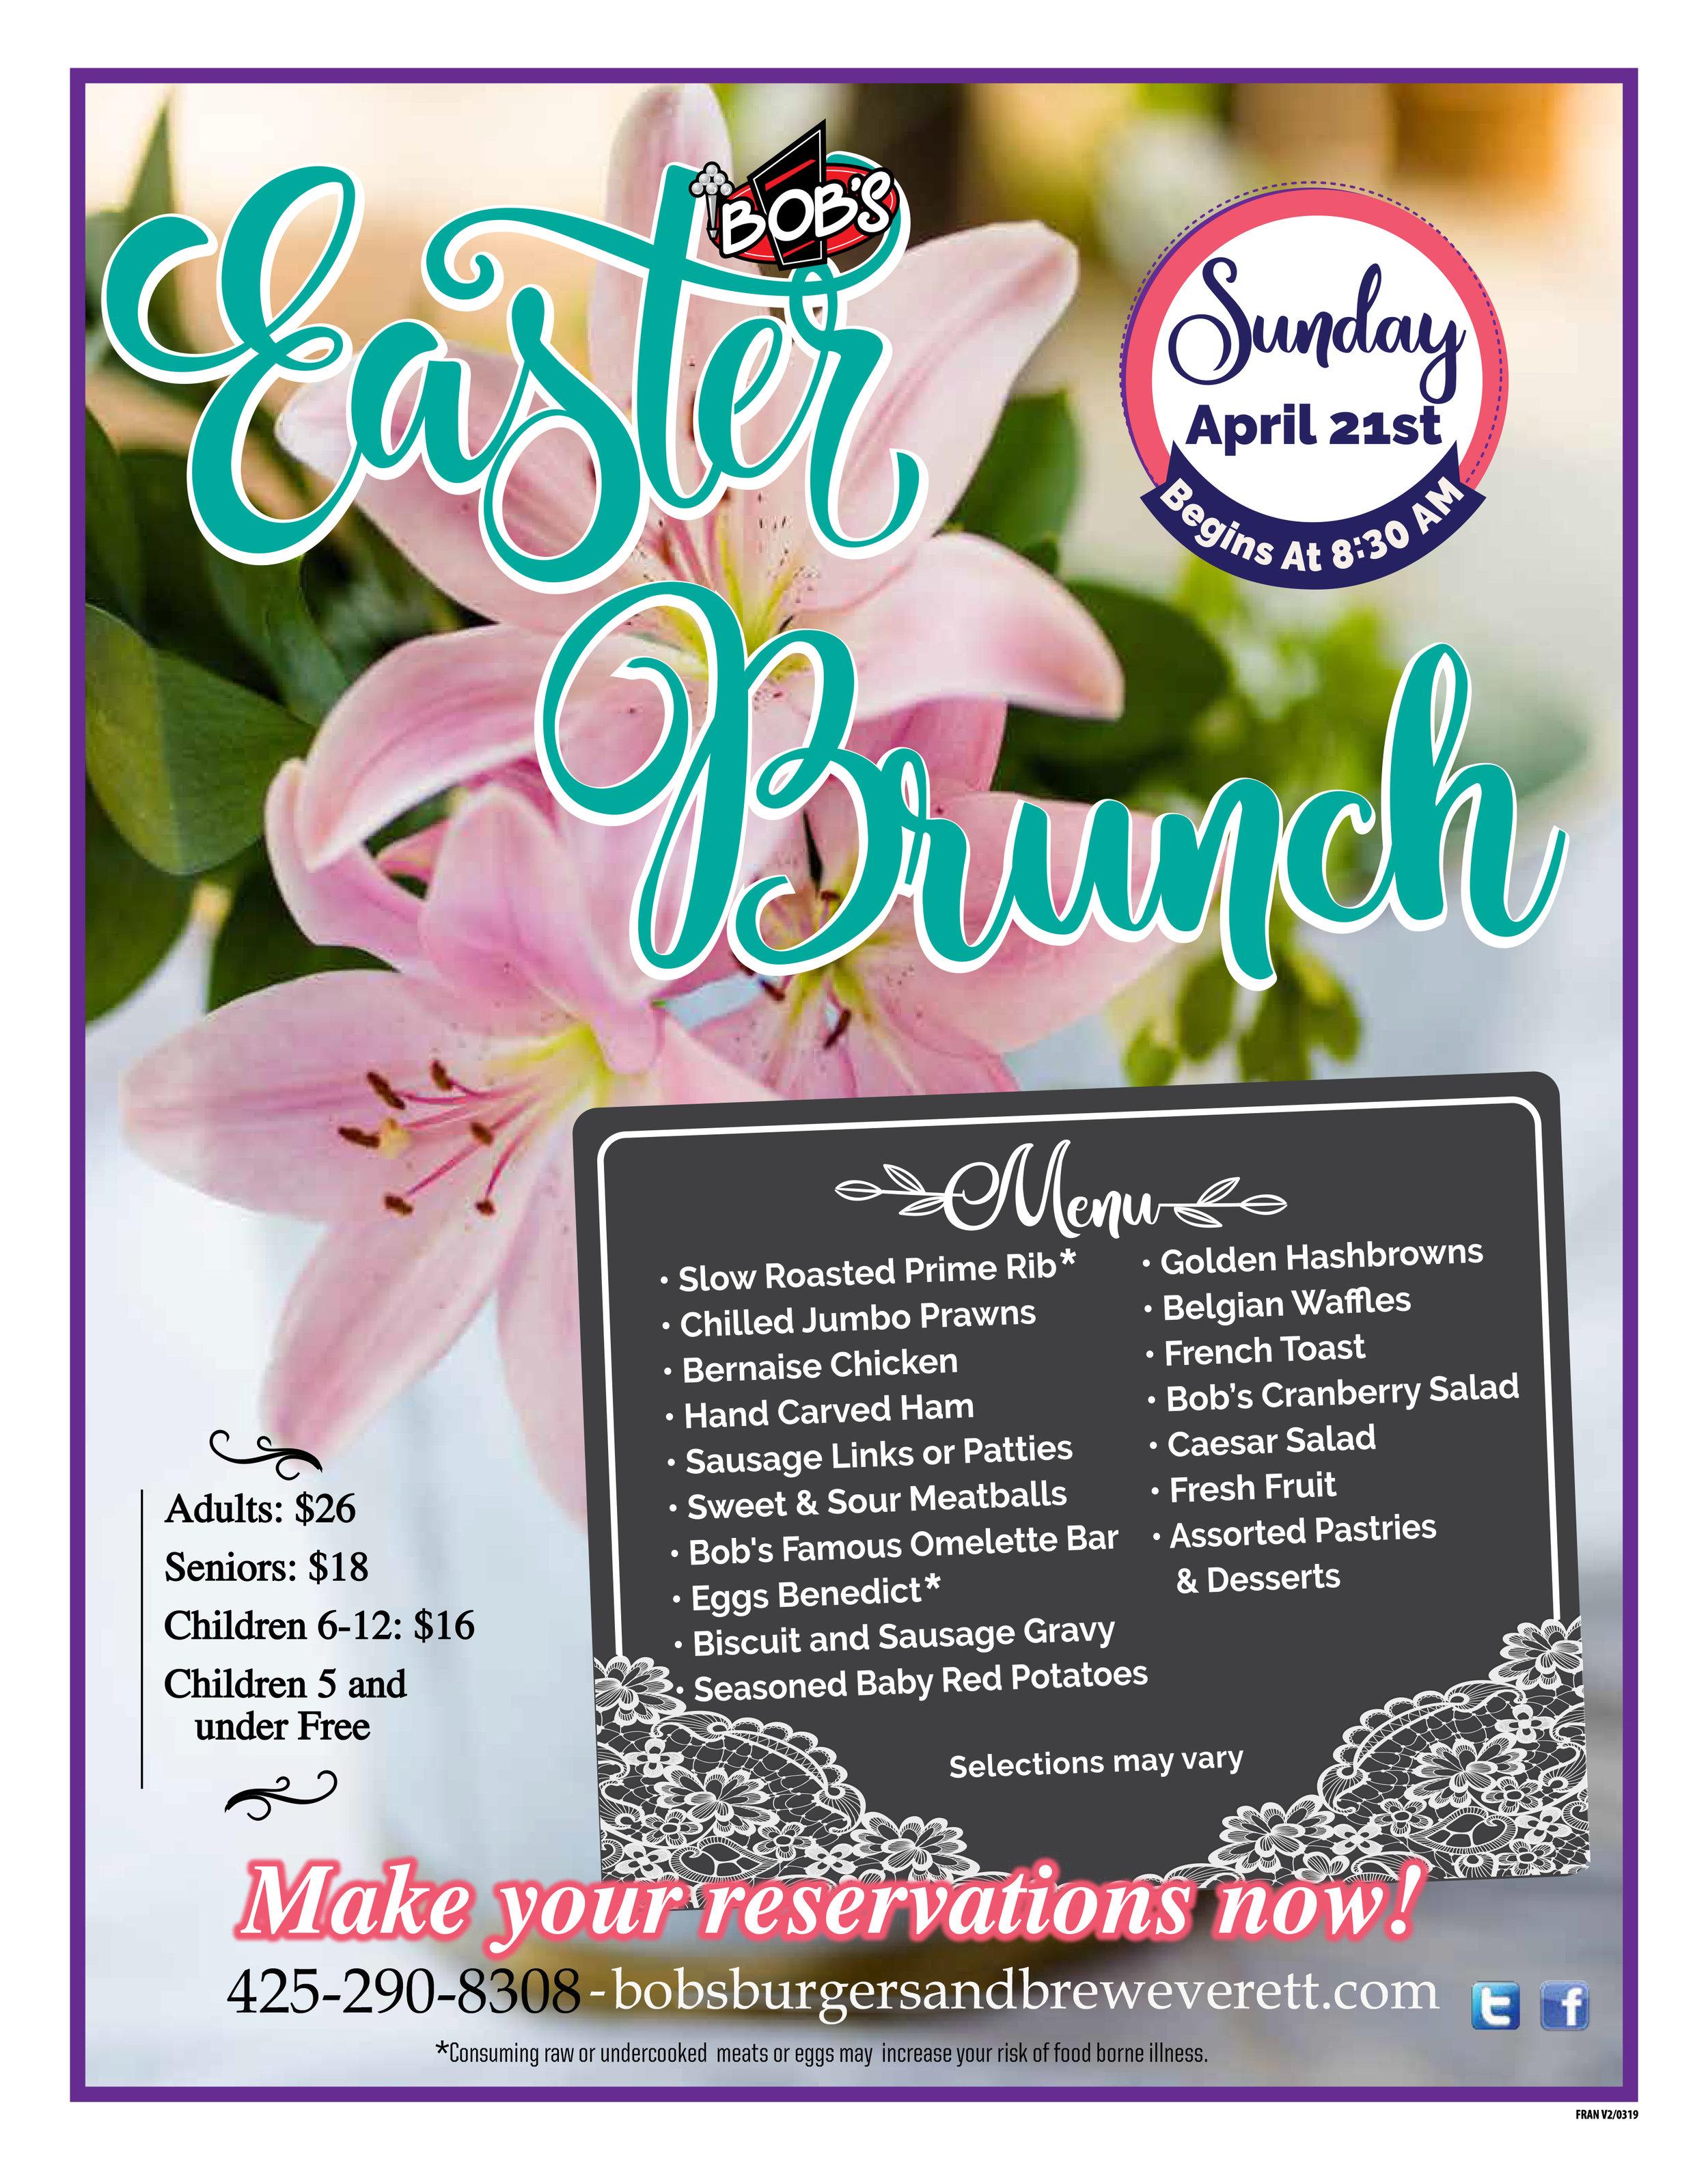 830 AM Easter Brunch Poster 1.jpg